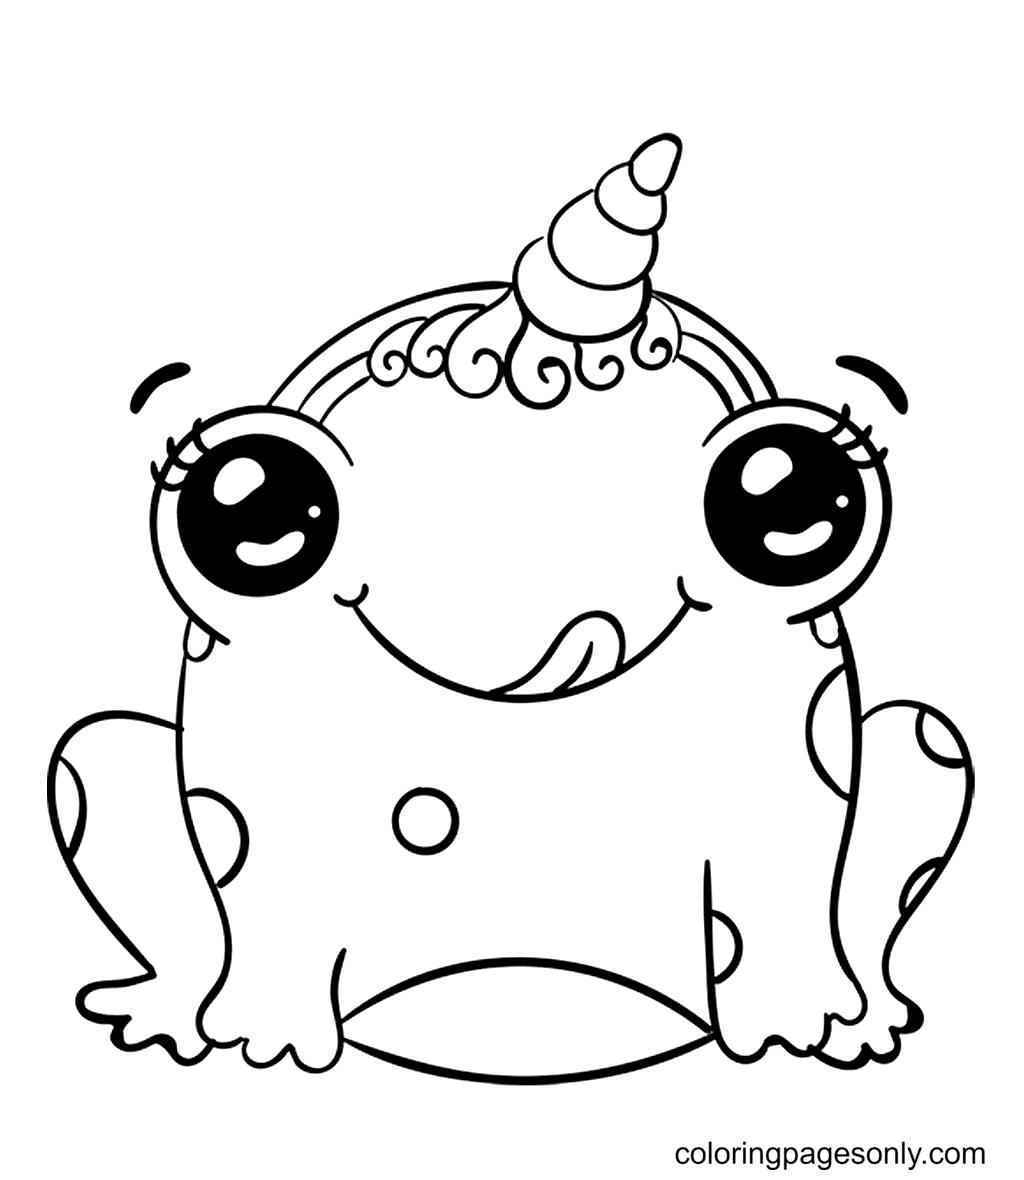 Frog Kawaii Coloring Page